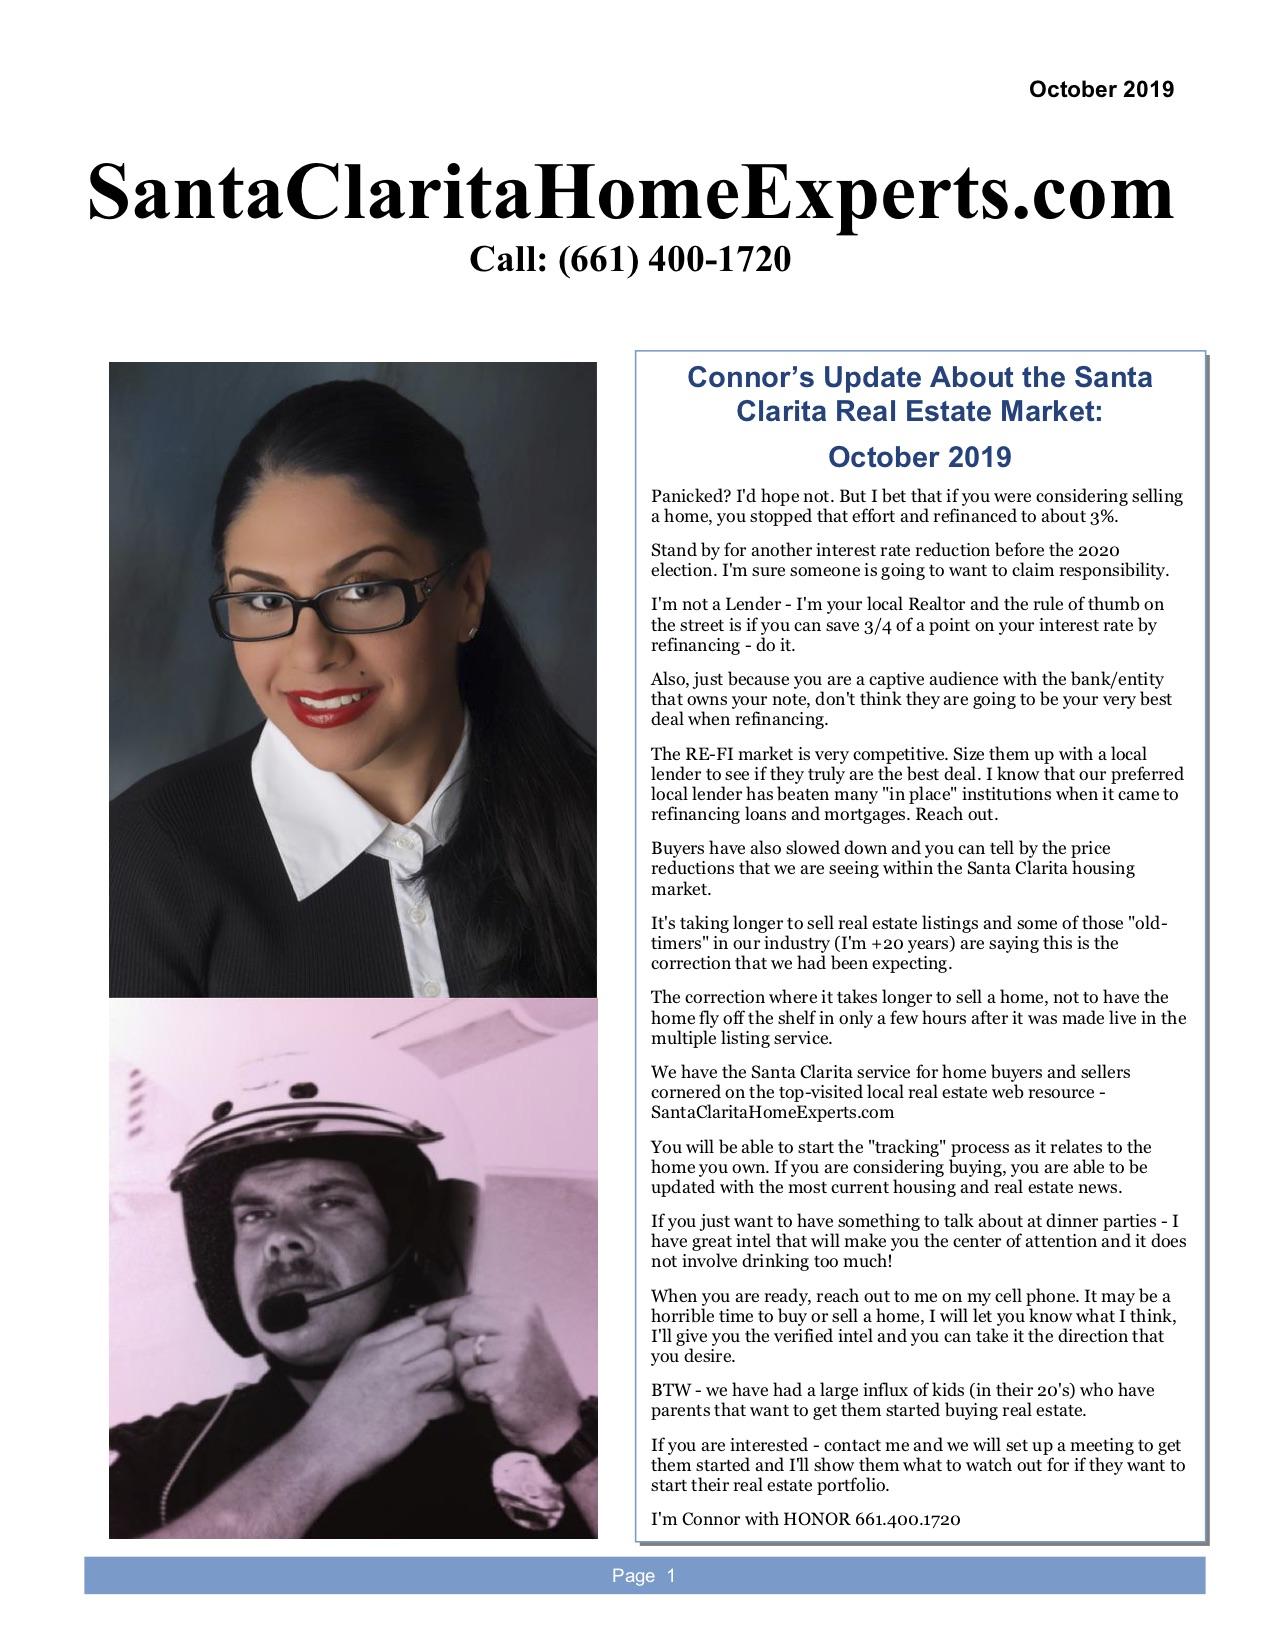 Santa Clarita newsletter